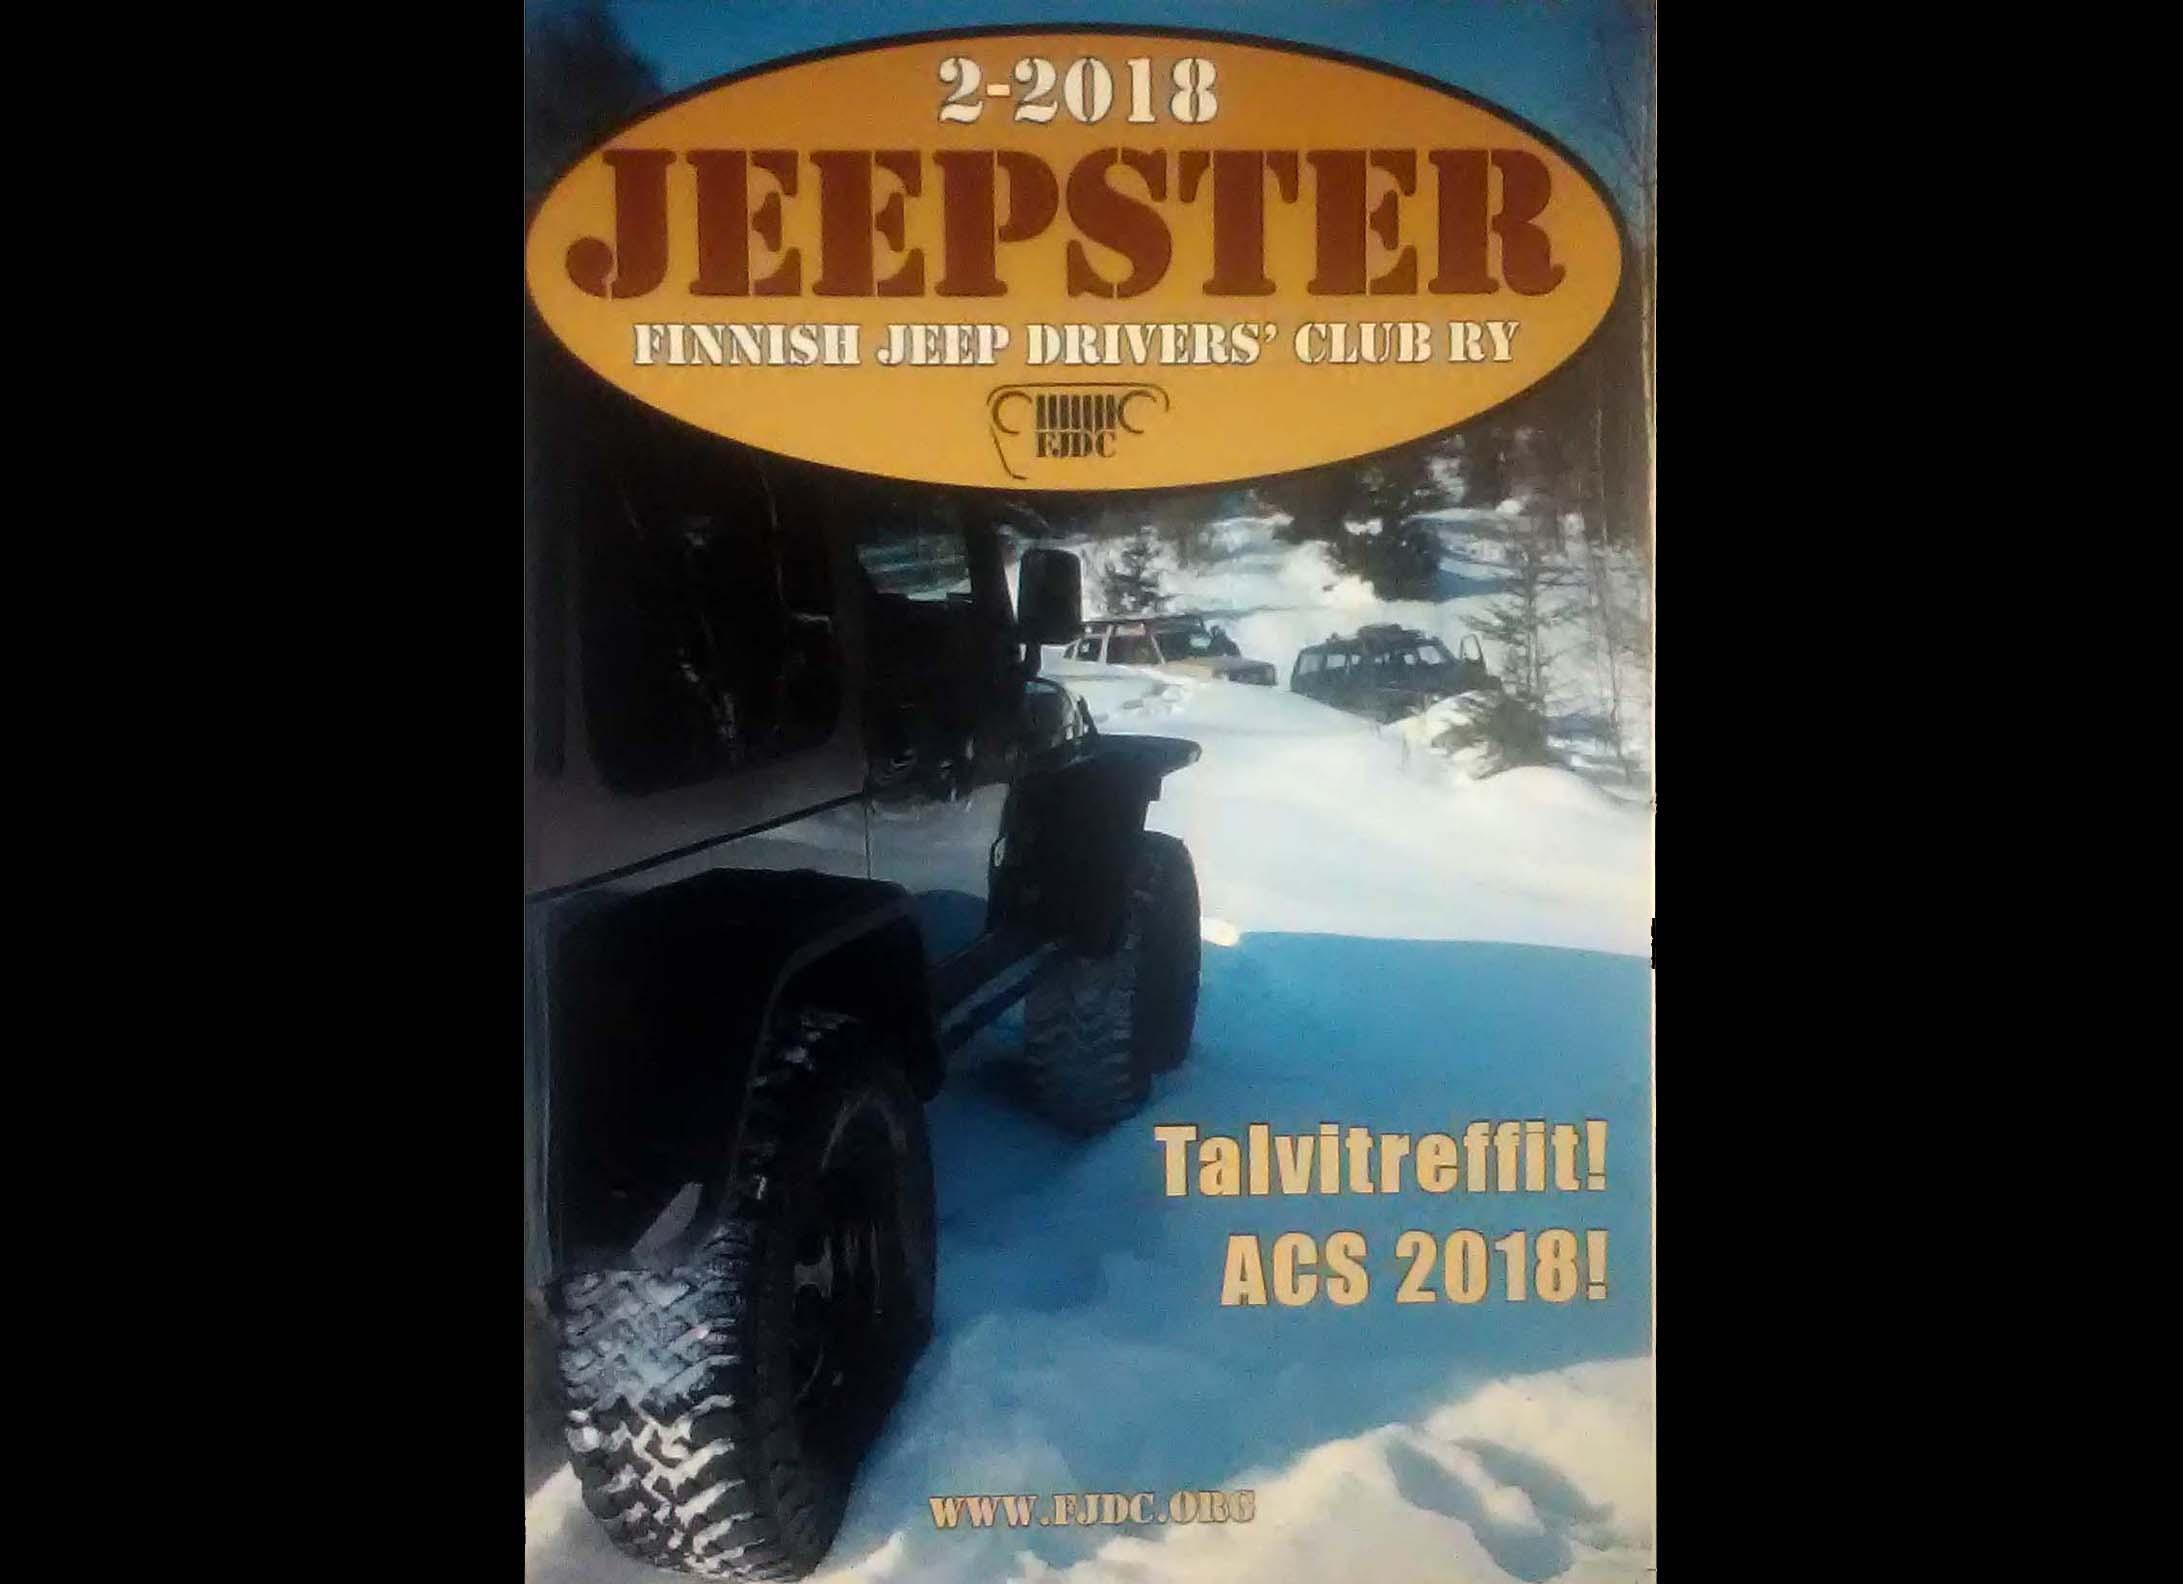 Jeepster-2-18-Nettiin